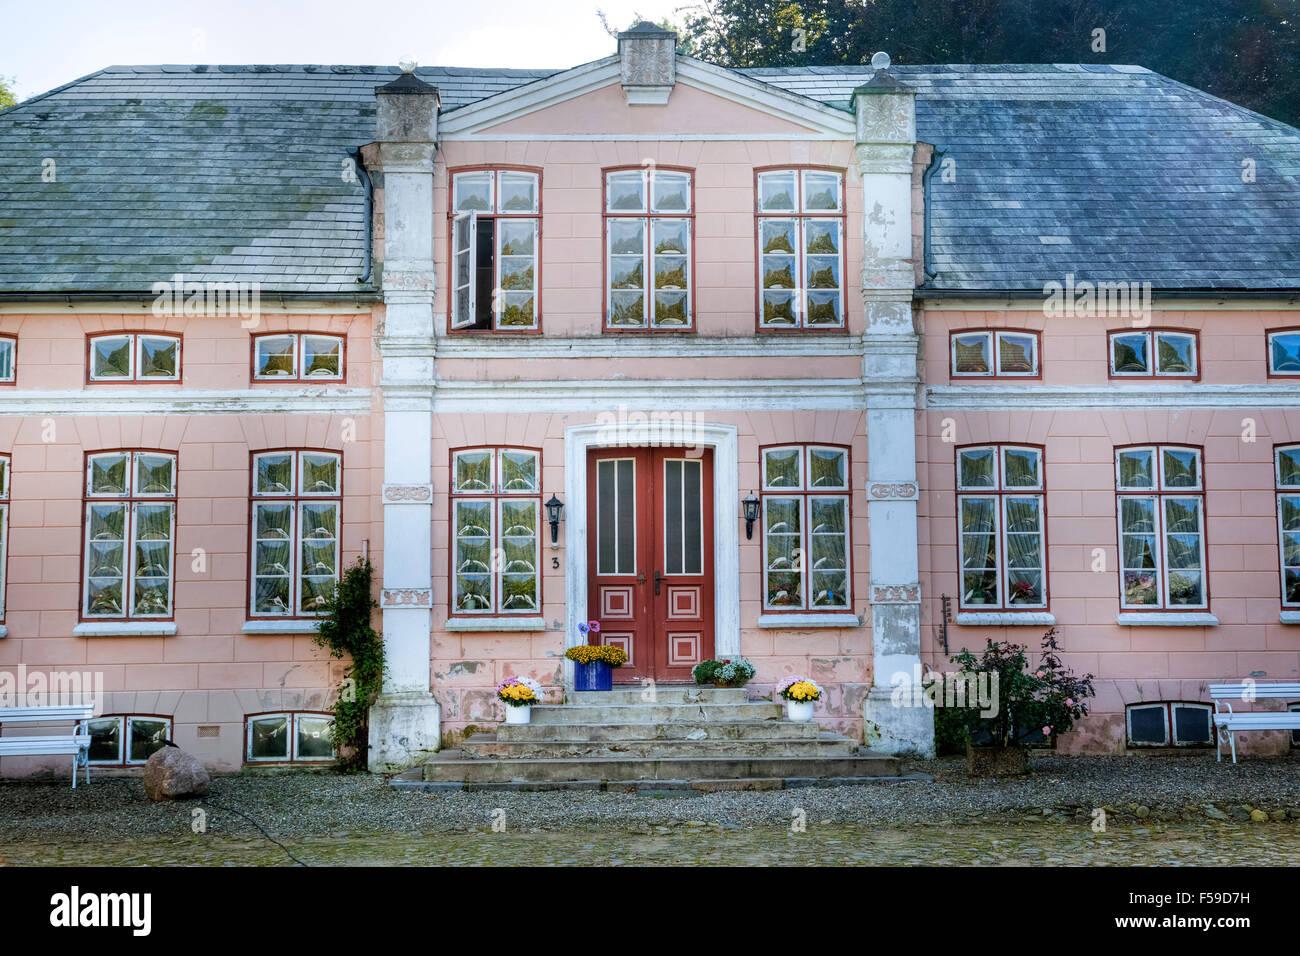 mansion, Unewatt, Schleswig-Holstein, Germany - Stock Image